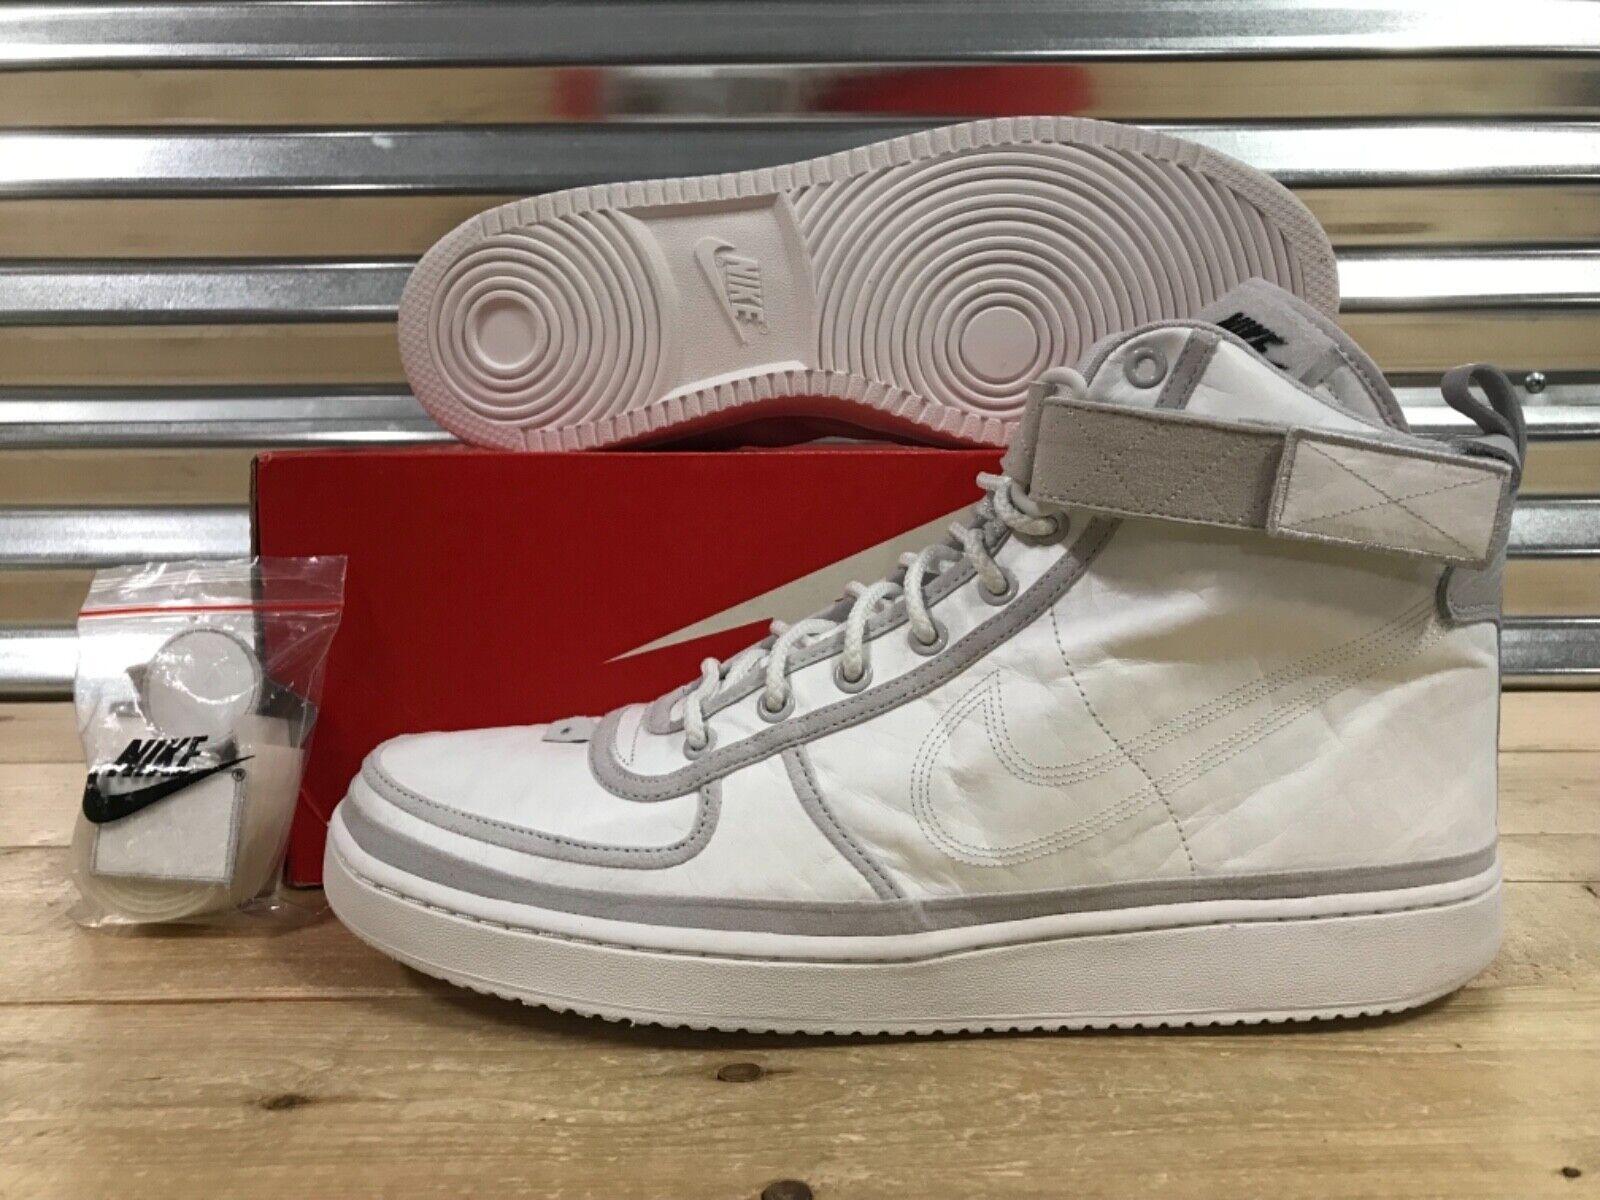 Nike Vandal High Supreme All Star QS shoes Vast Grey White SZ ( AQ0113-001 )